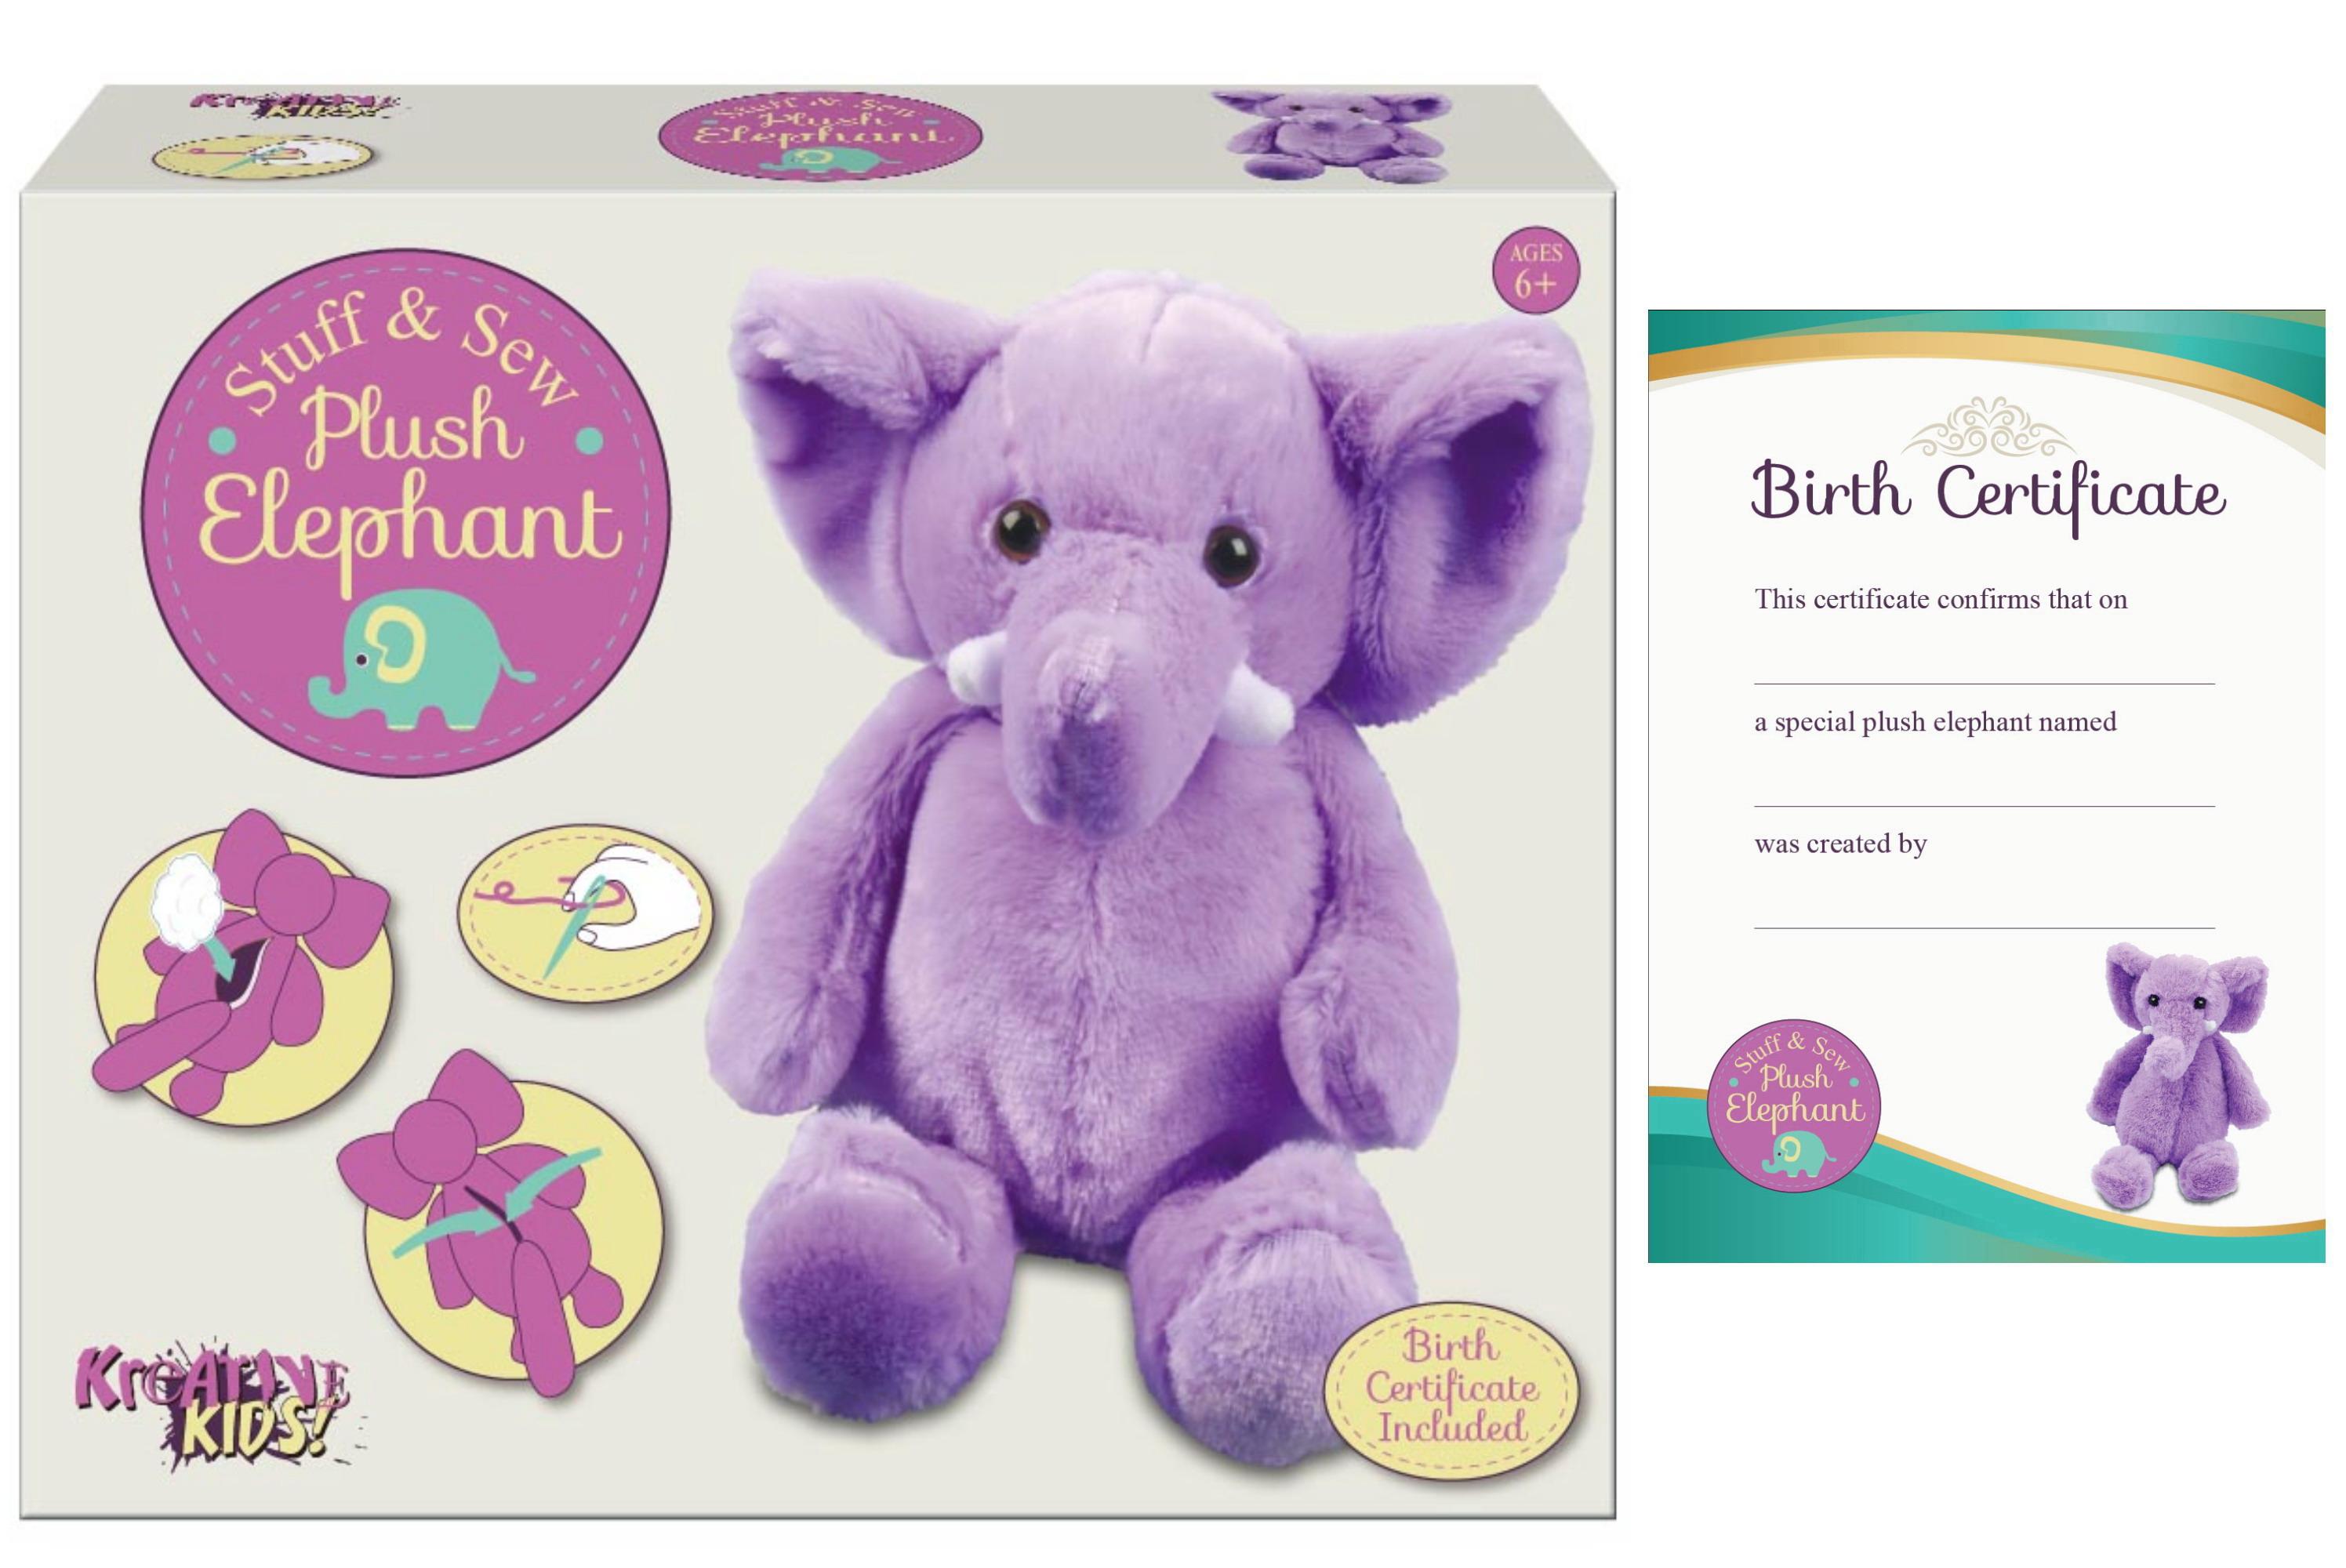 Large Stuff & Sew Plush Elephant In Colour Box